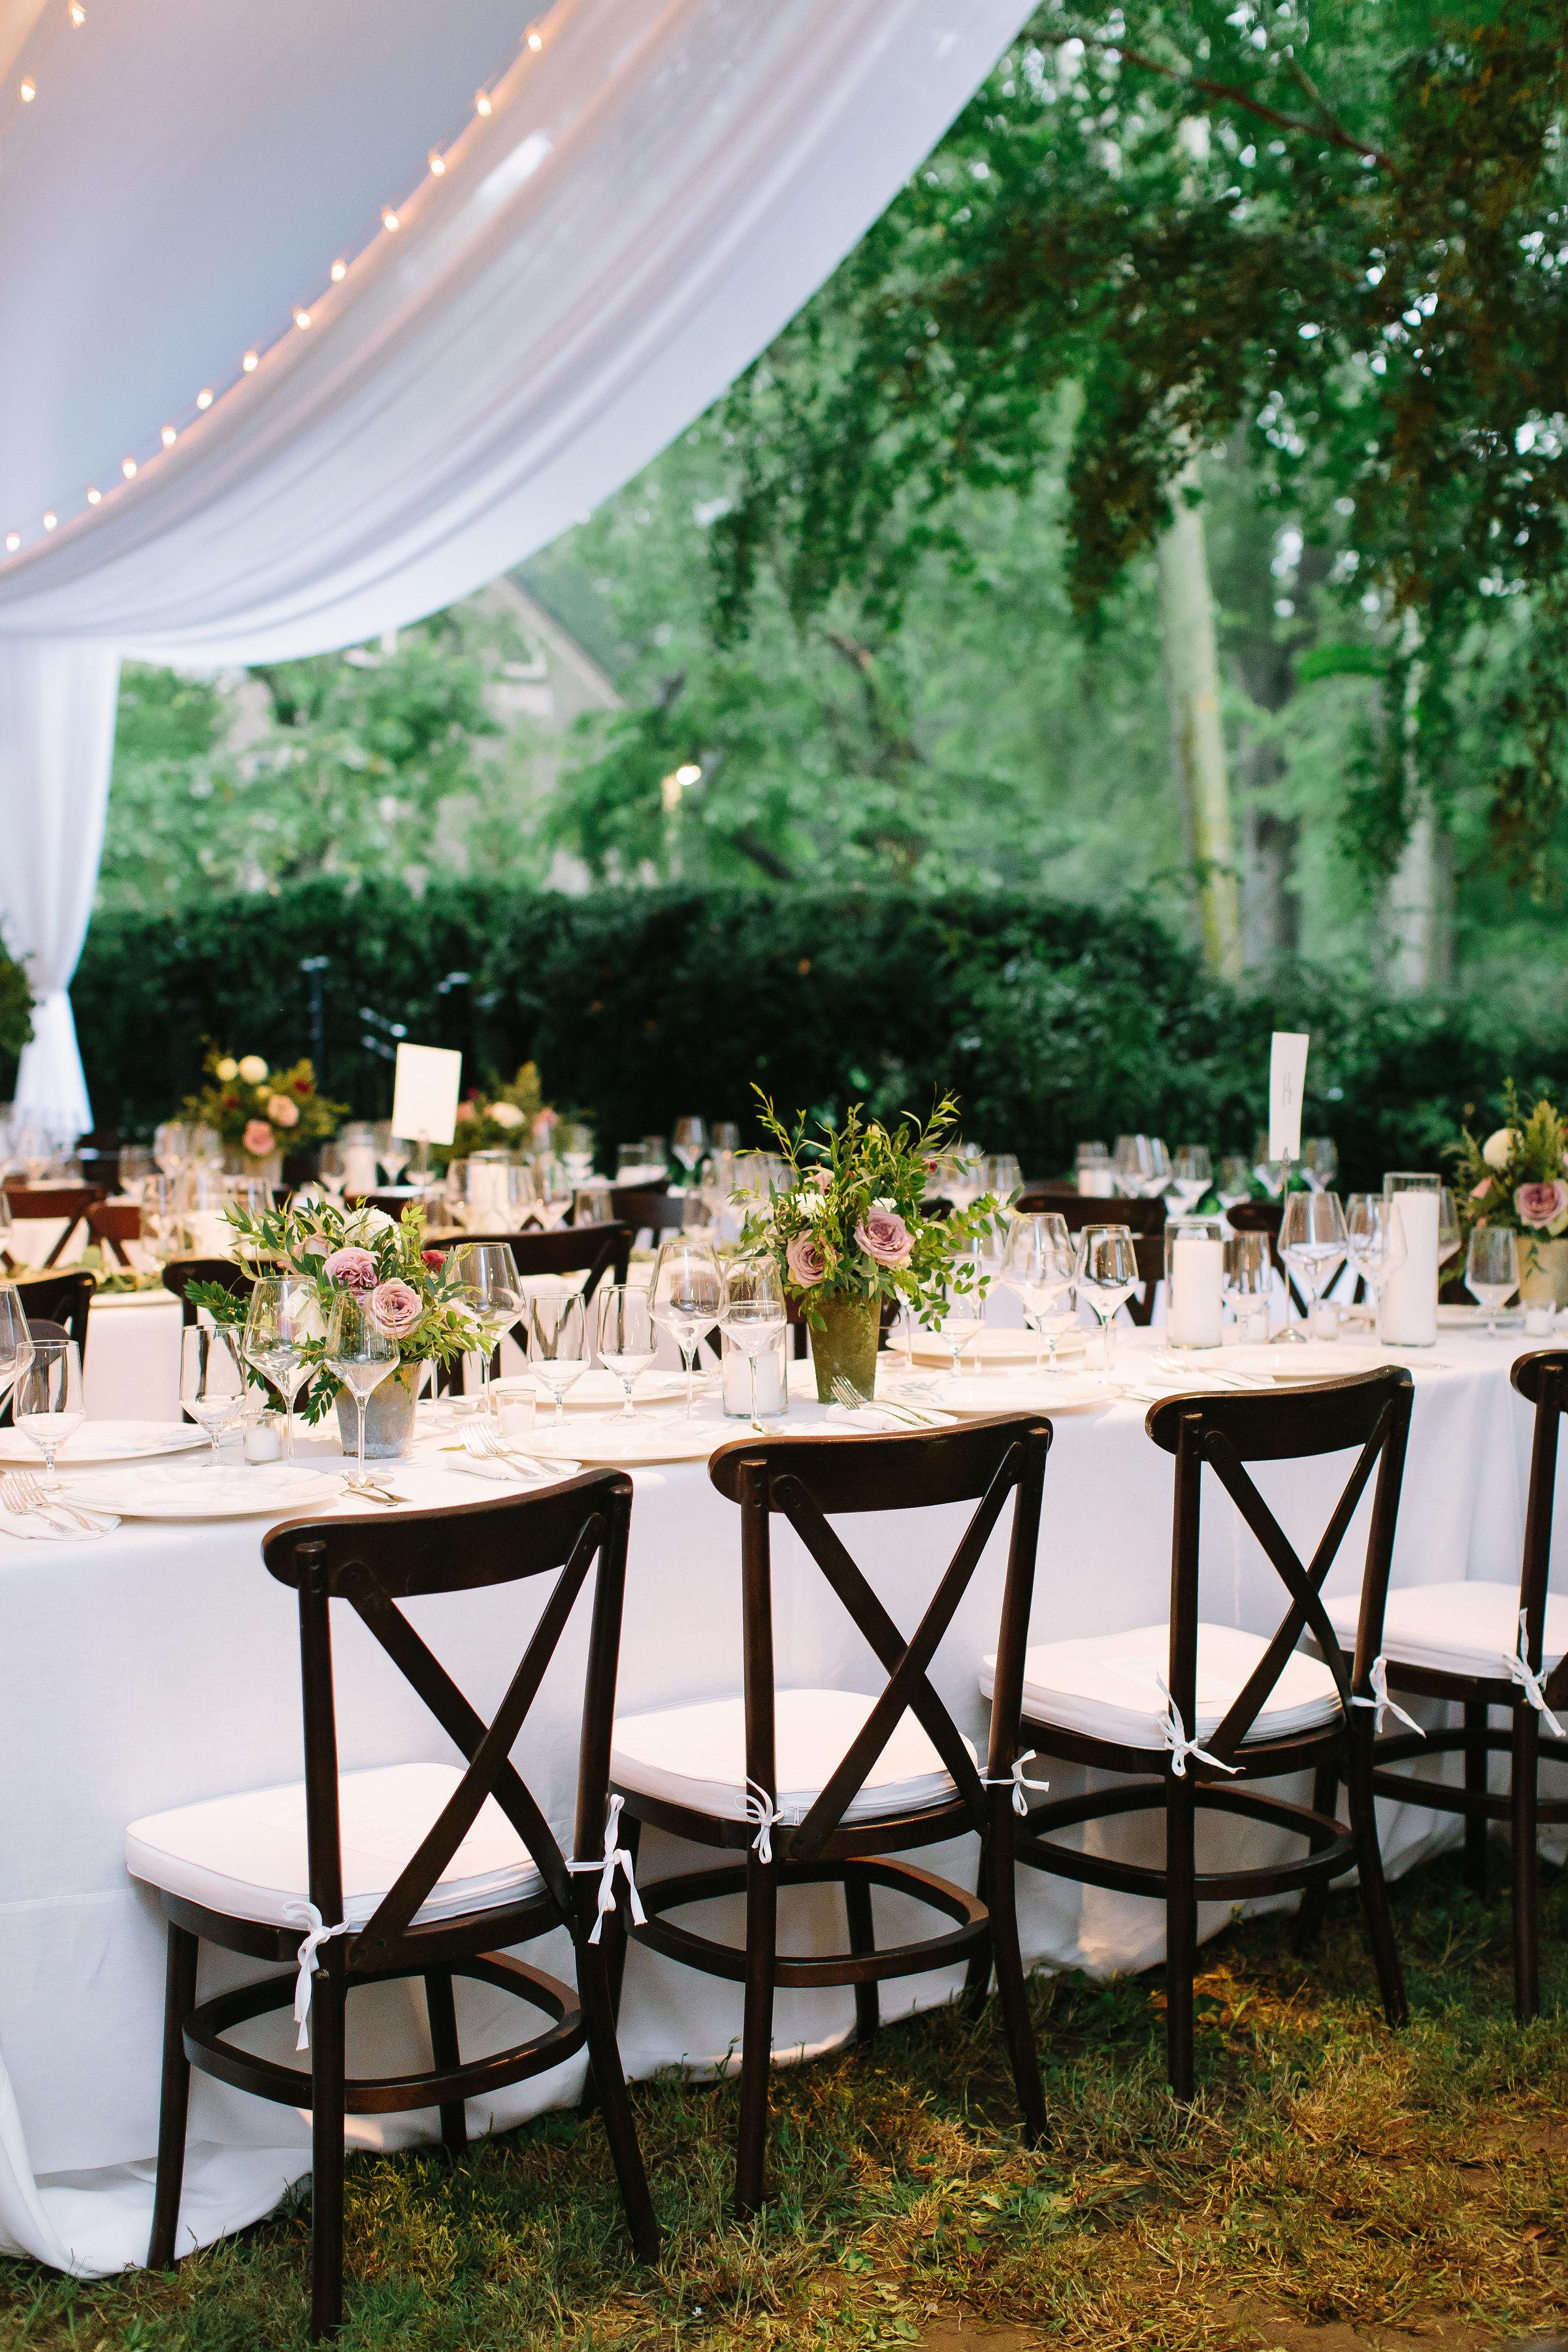 Lush, natural centerpiece of garden roses, ranunculus, and greenery // Nashville Backyard Wedding Flowers